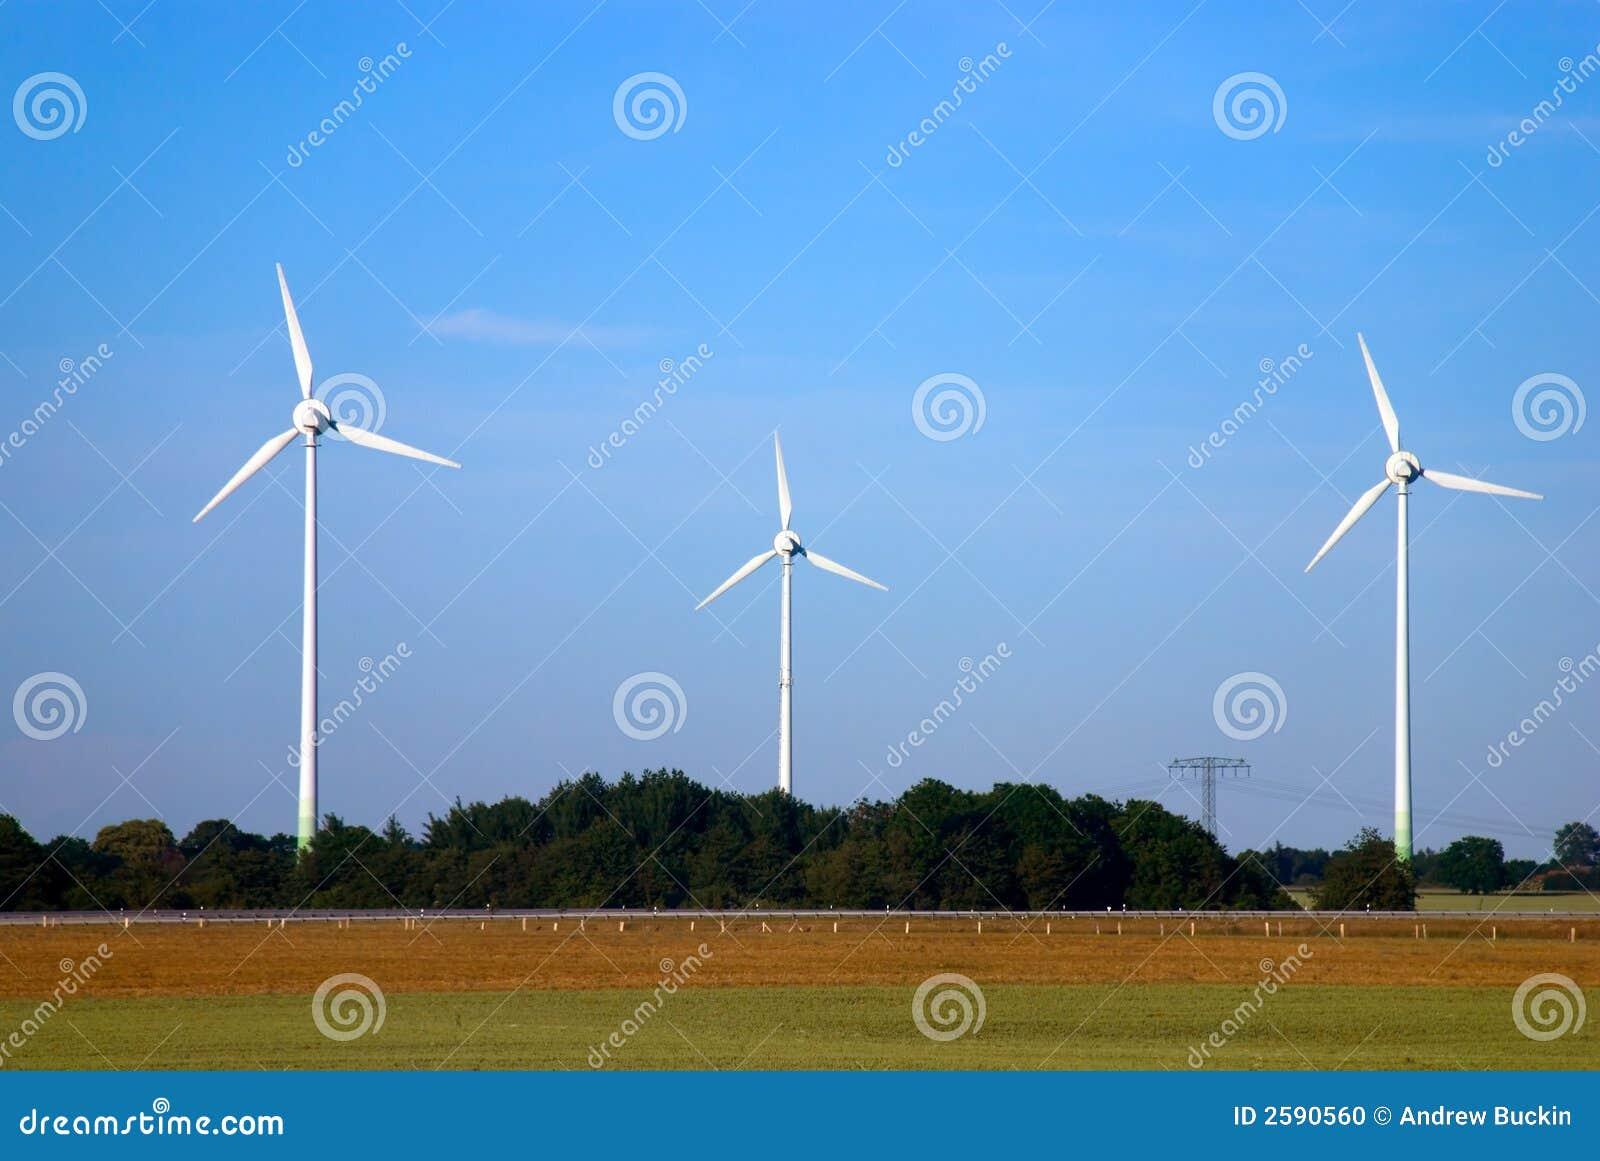 Windmolens 1